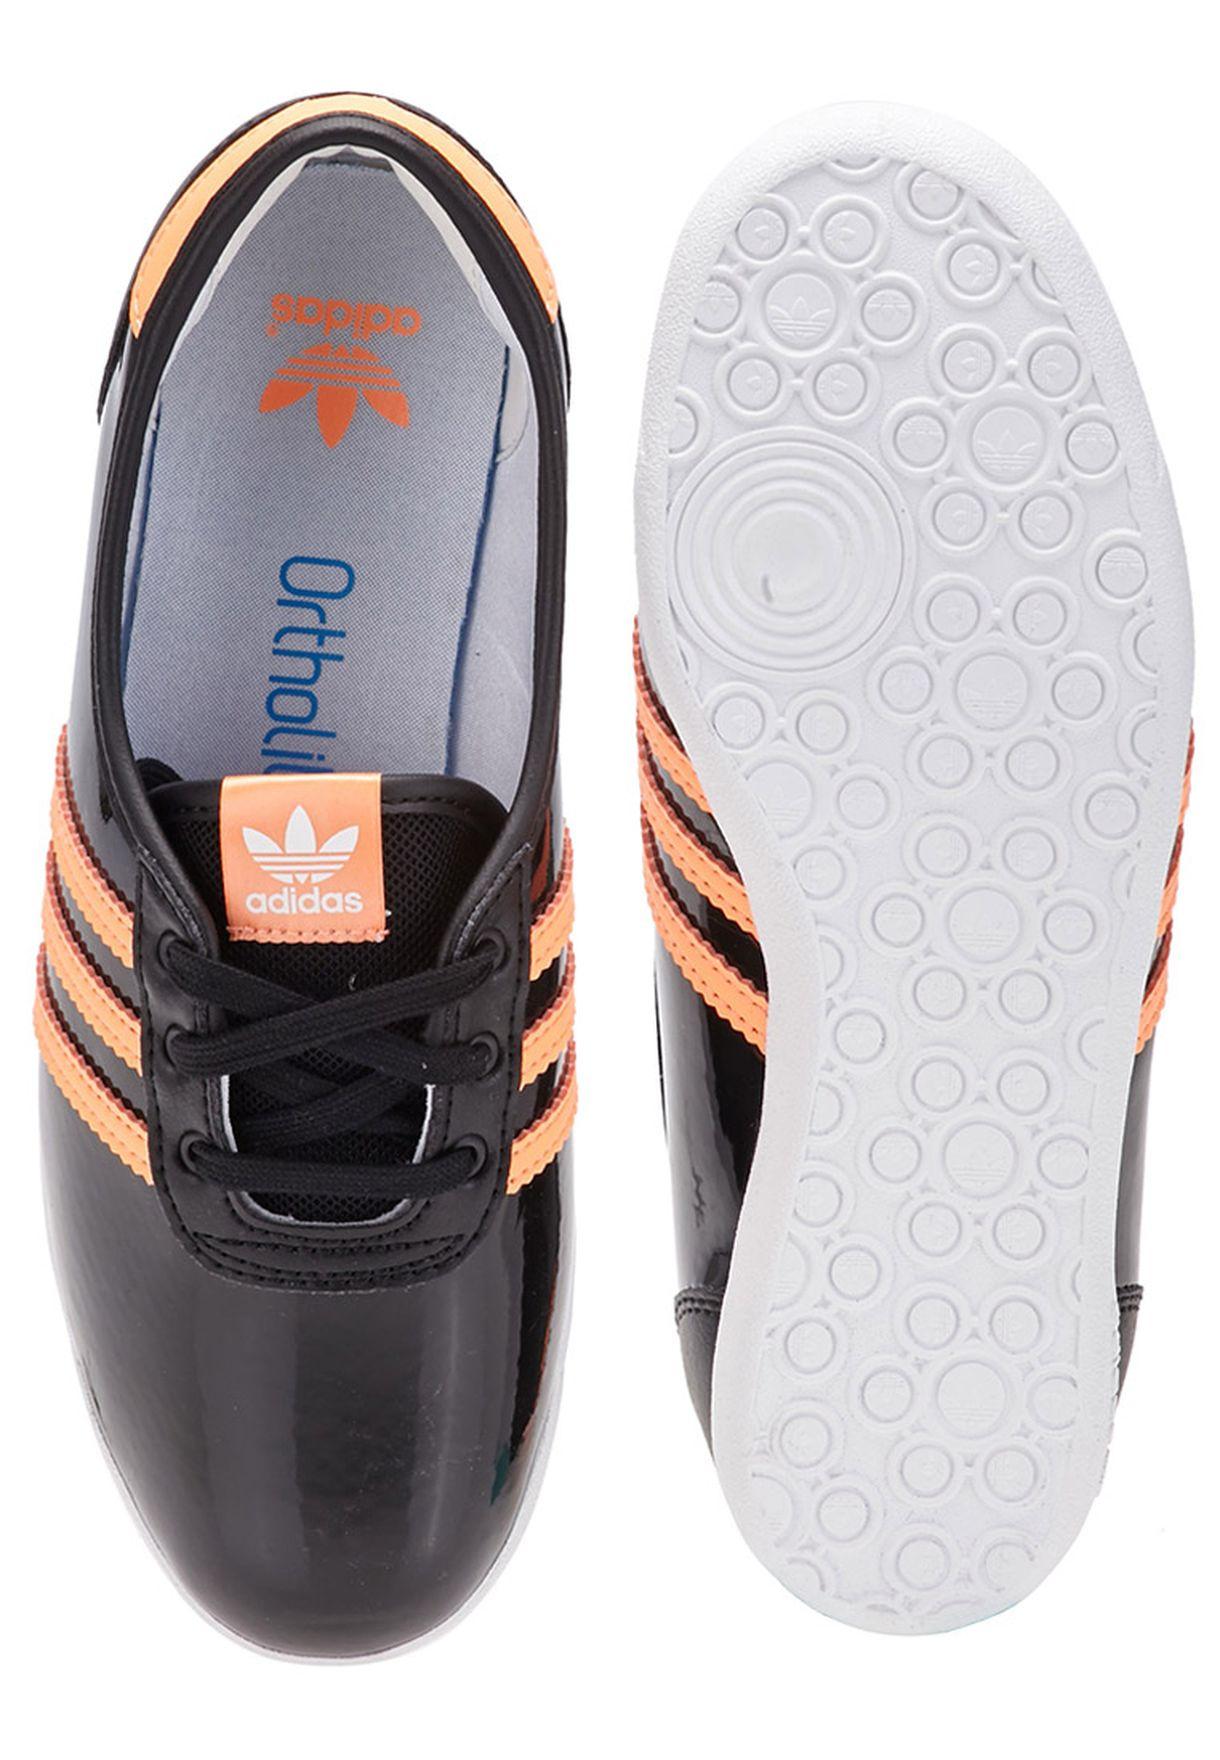 4f4a17eceb7 Shop adidas Originals black Forum Slipper 2.0 Youth B25031 for Kids ...